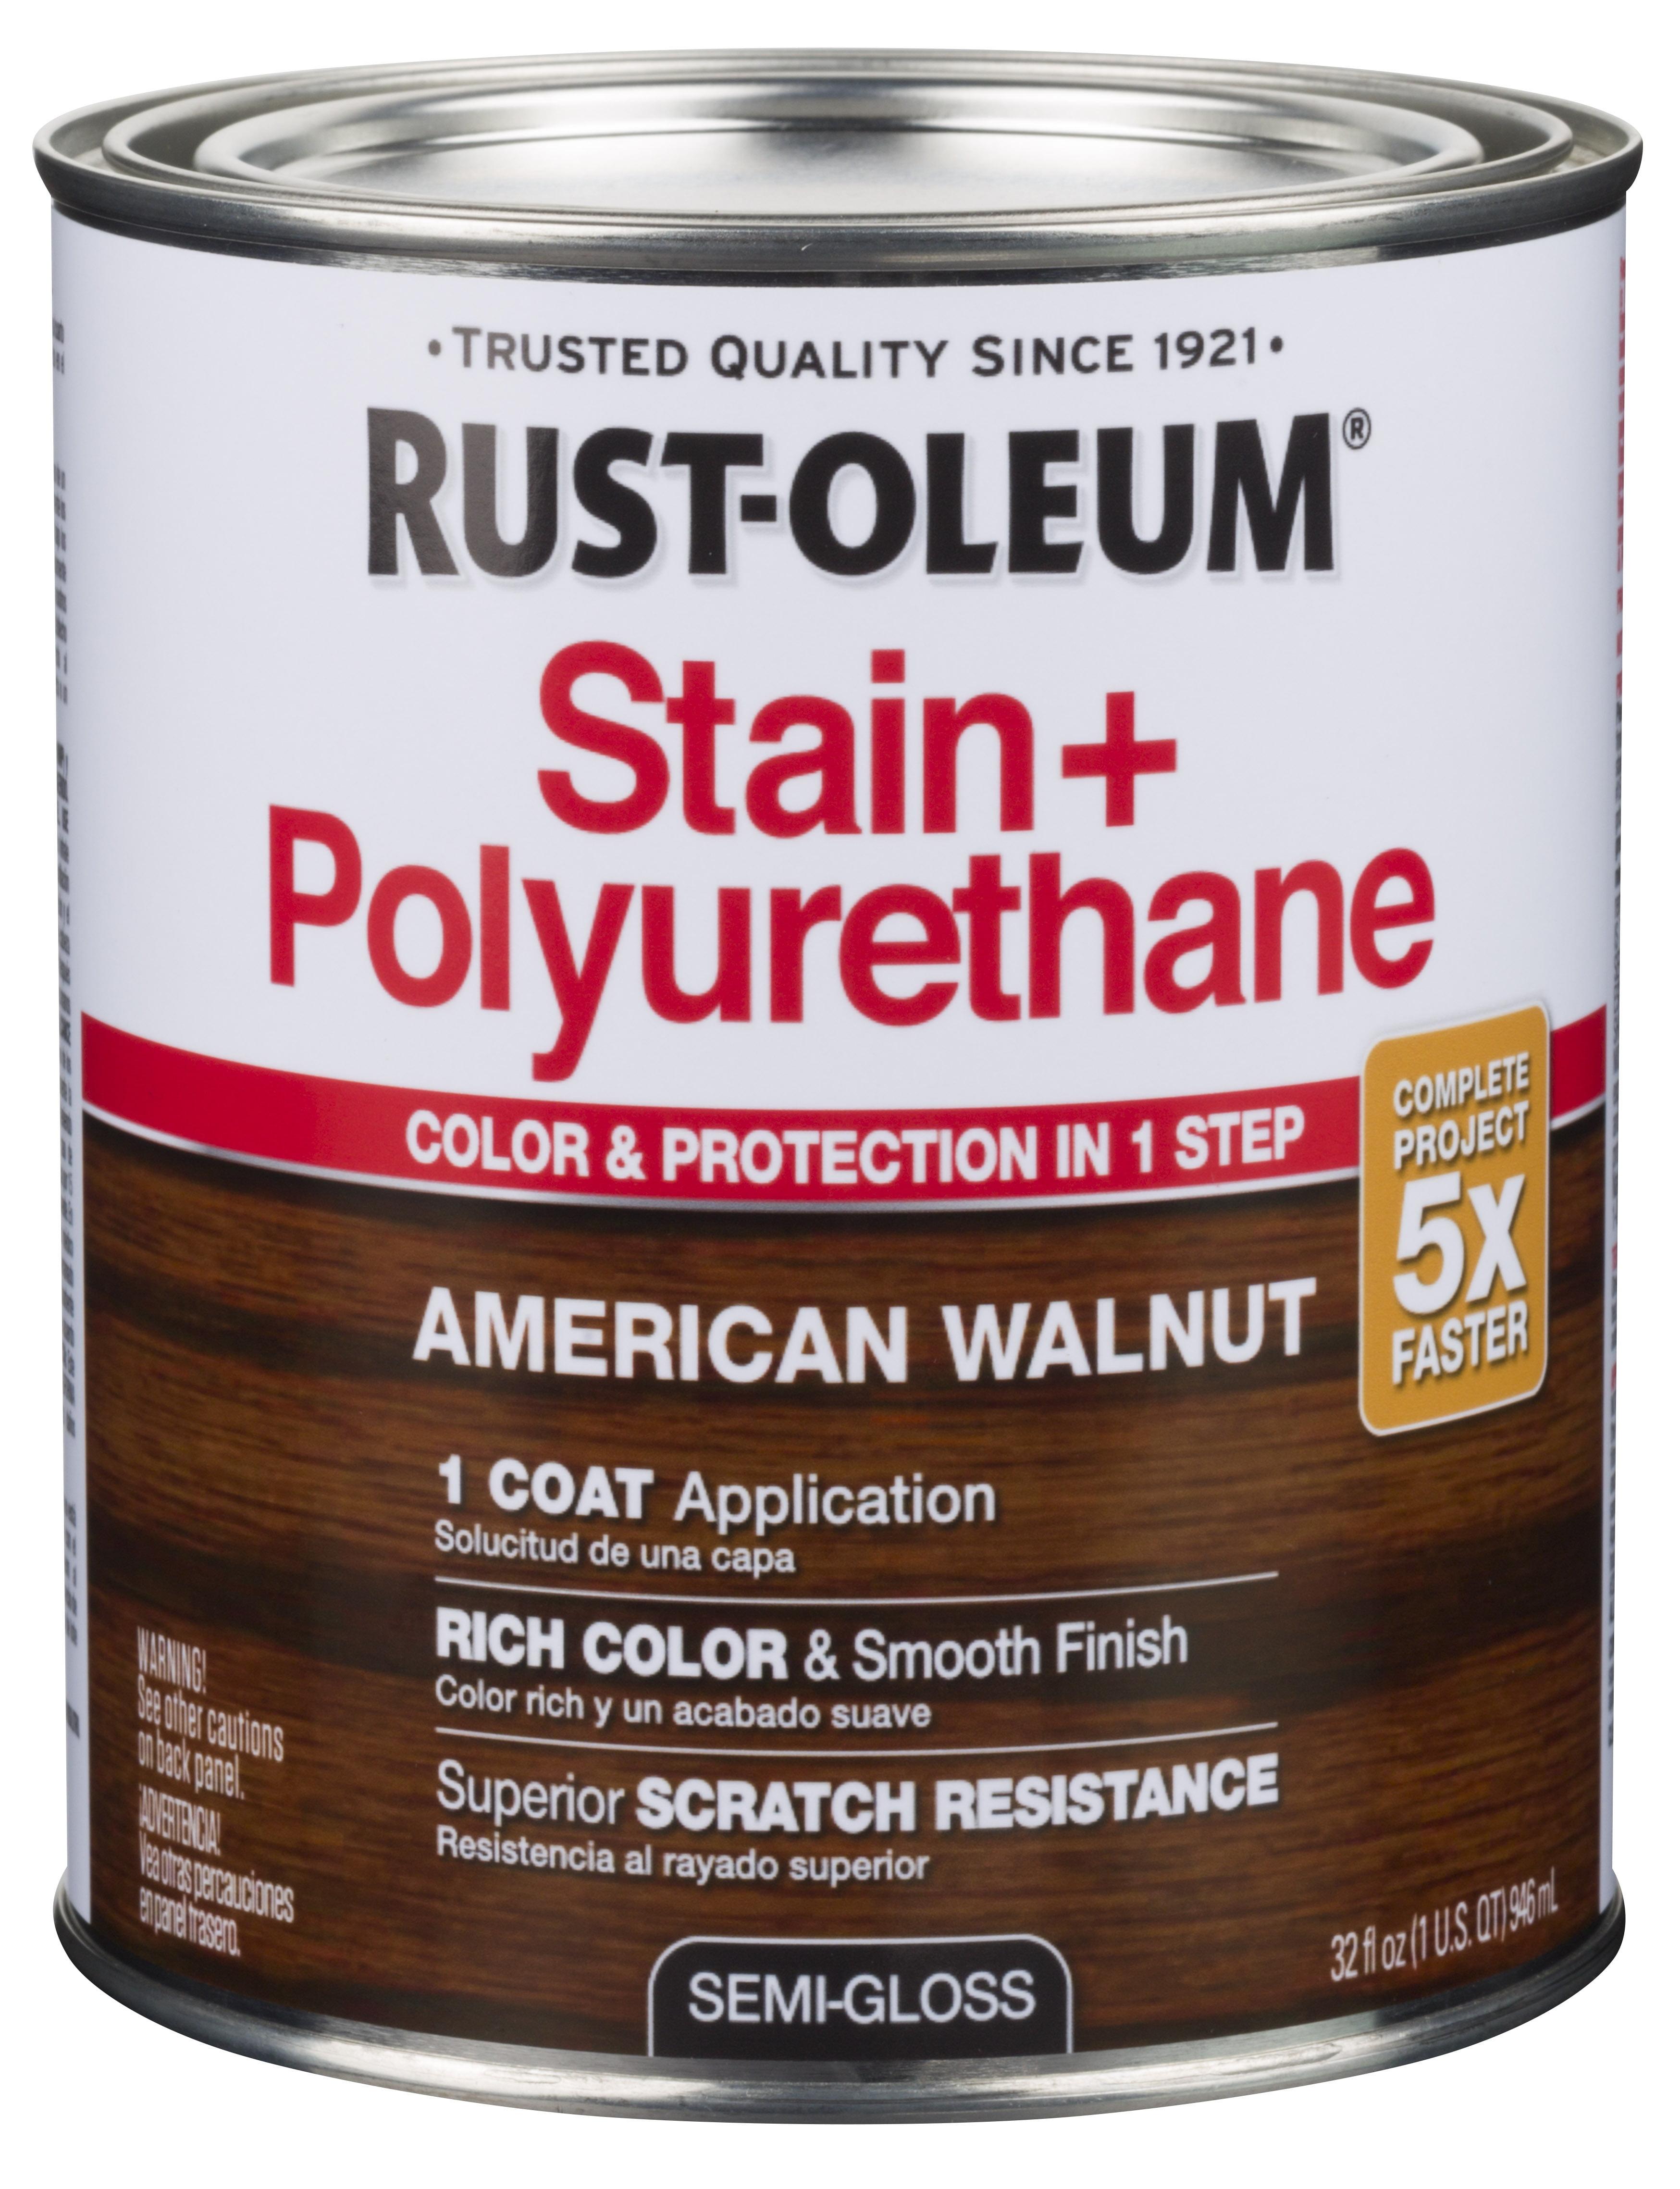 American Walnut Rust Oleum Stain